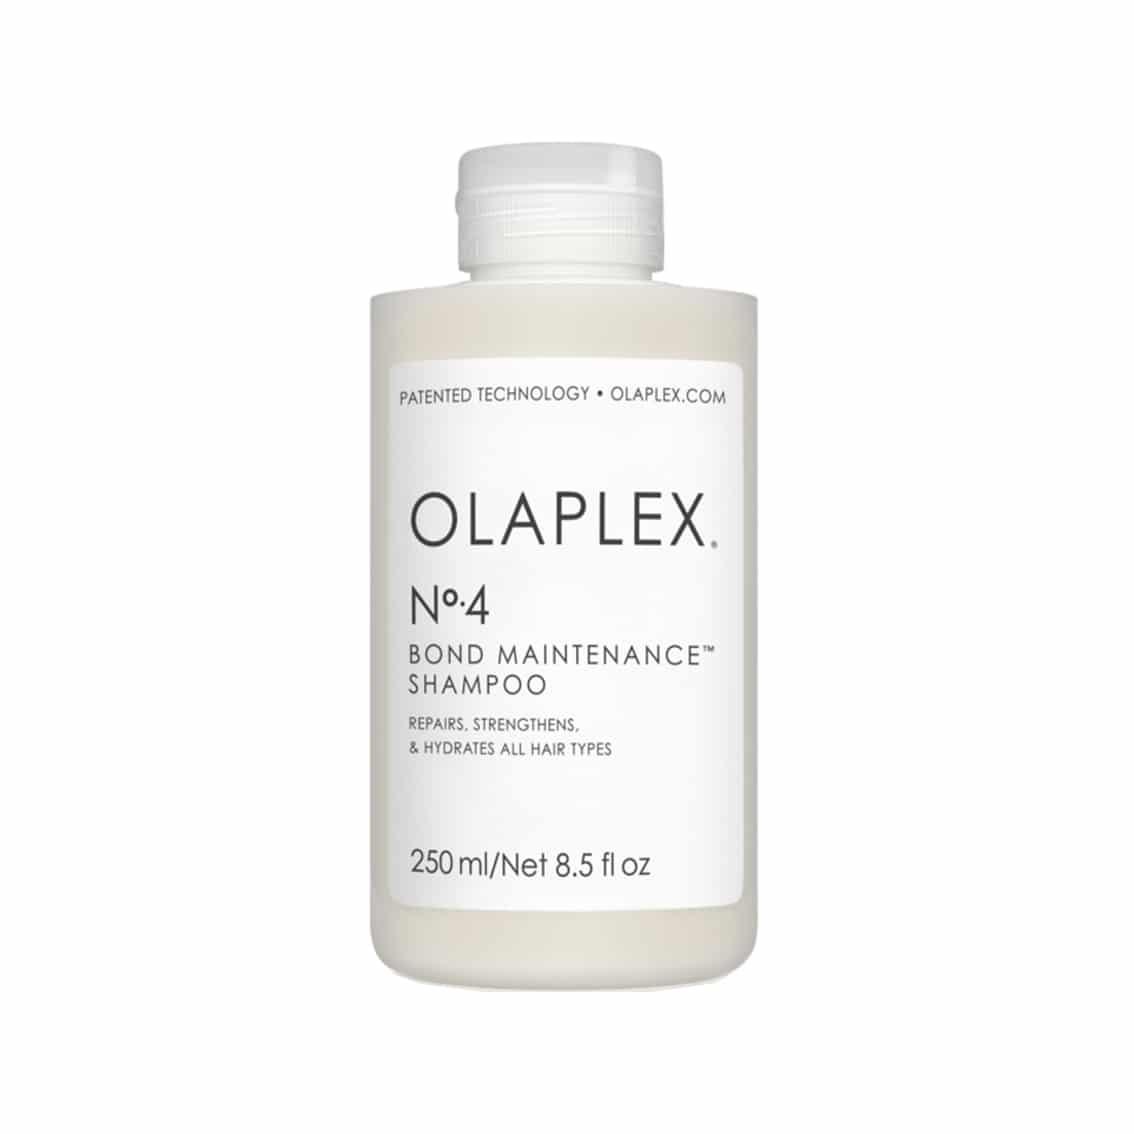 Olaplex Nº 4 Champú Bond Maintenance 250 ml